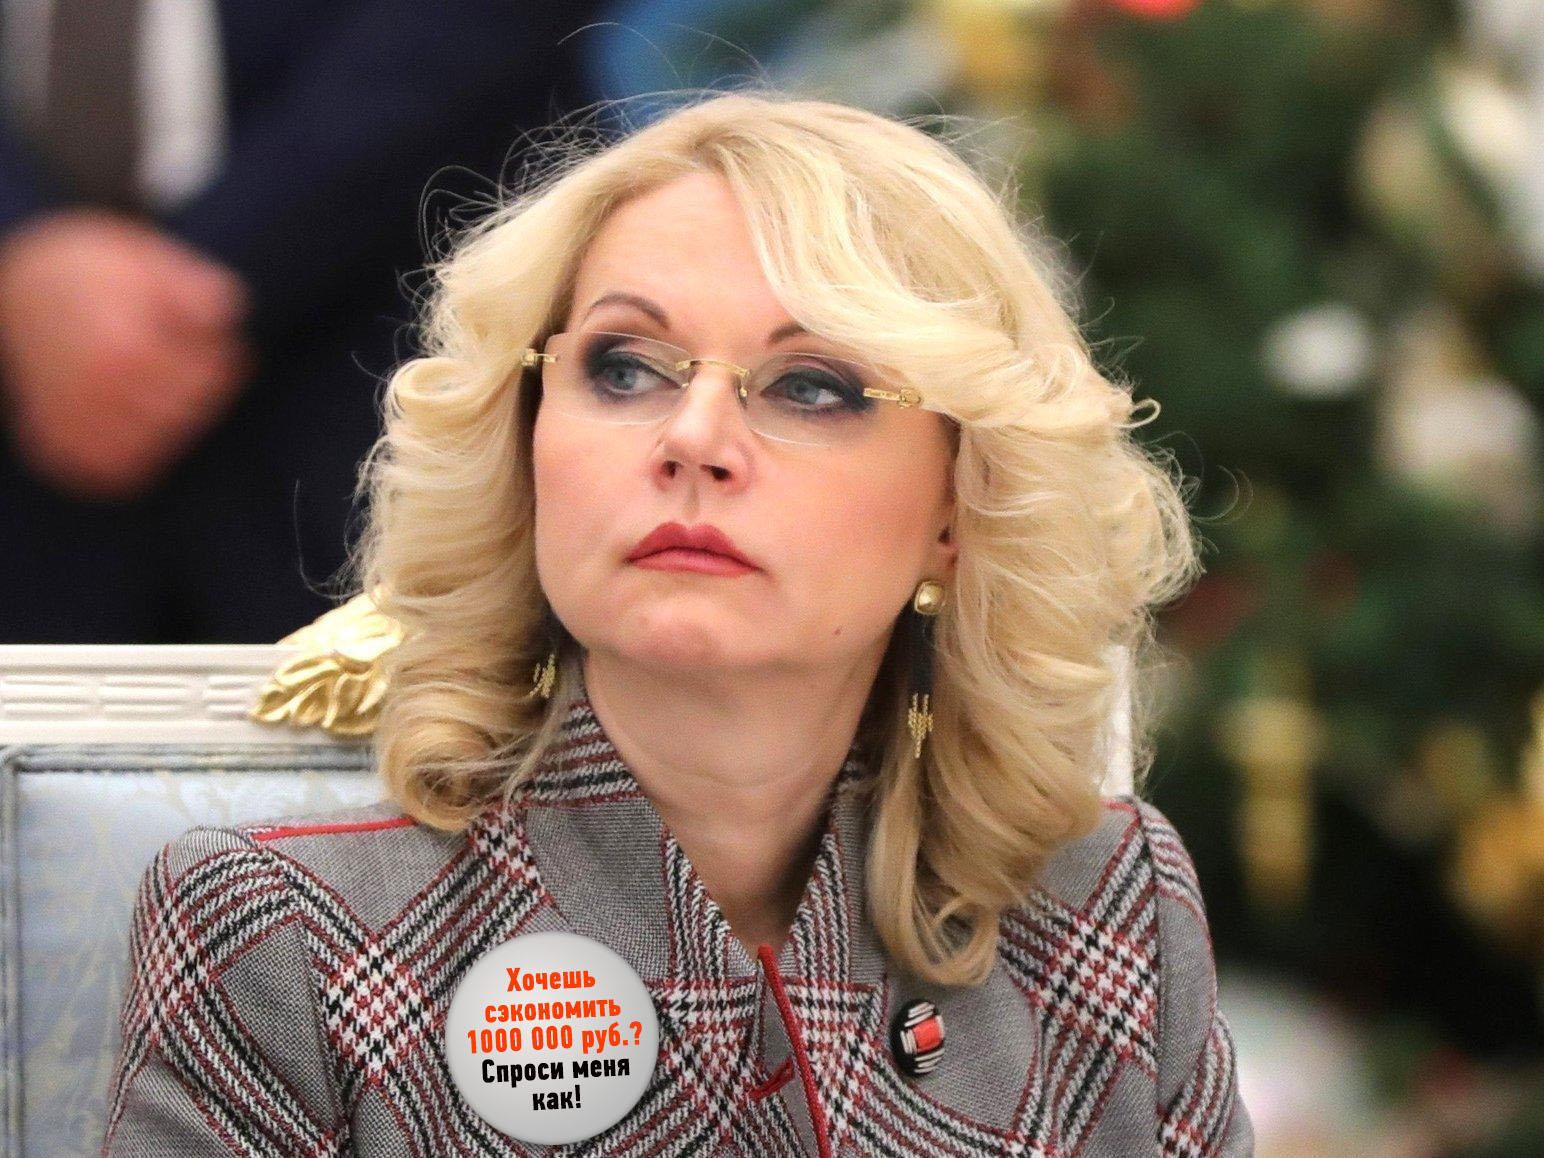 Страшно далека Татьяна Голикова от народа